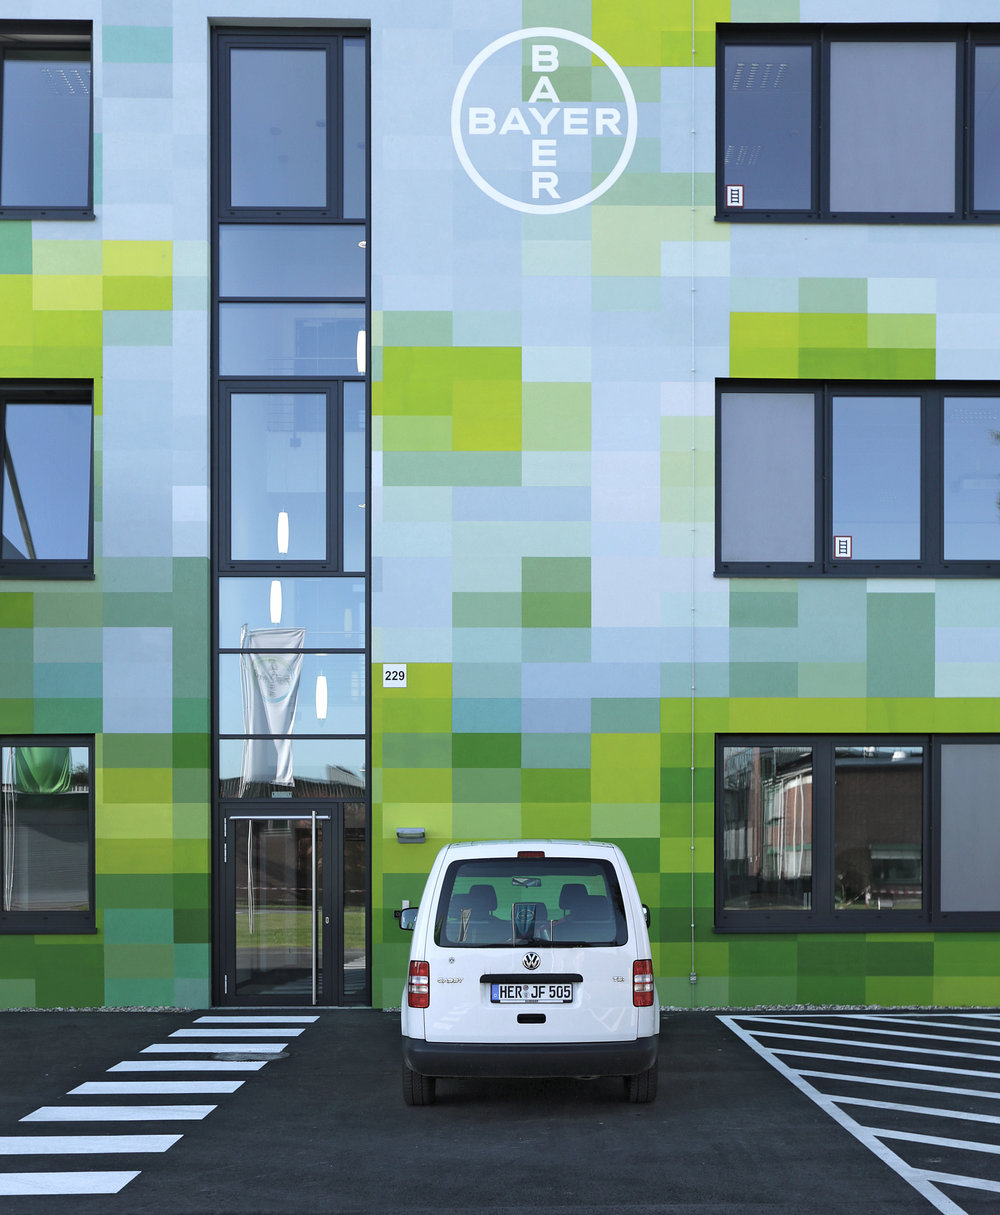 Fassadengestaltung-auf-Putz-bayer-logo-reklame-farbkonzept-pixel-grafik.jpg